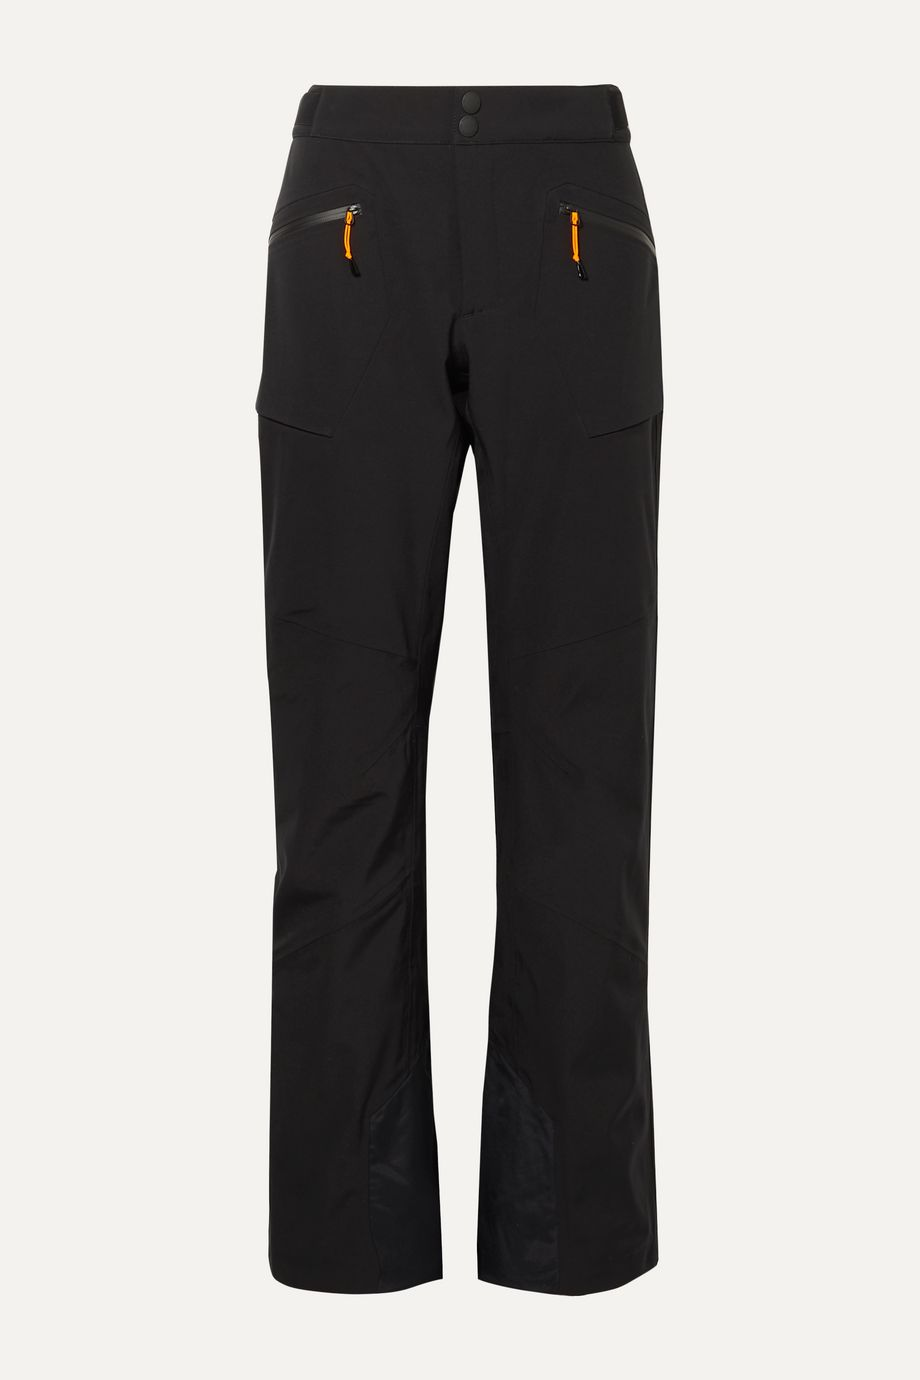 BOGNER FIRE+ICE Jane 2 ski pants